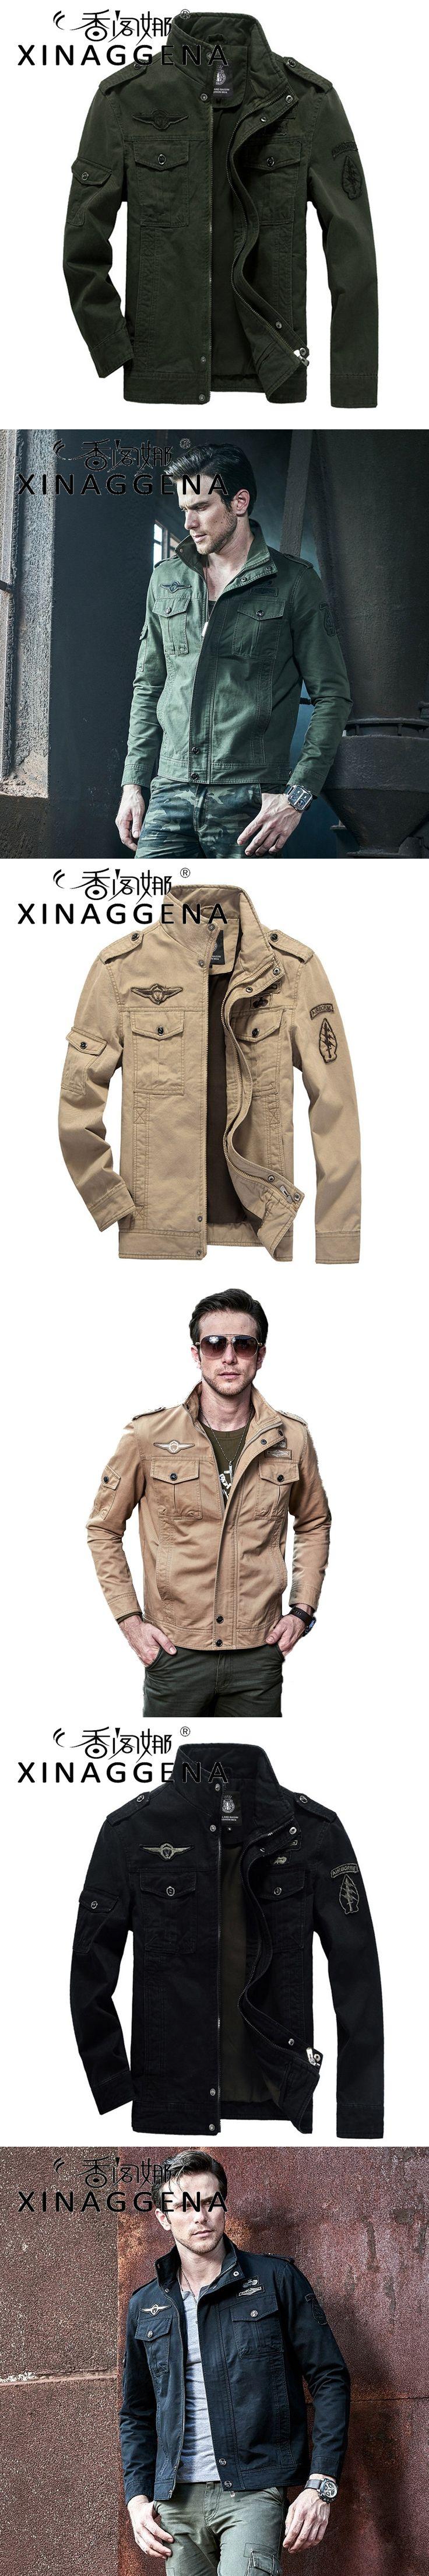 American Military Uniform Jackets Men Youth Moto Biker Zipper Jacket Safari Style Chaqueta 6XL School Season Flight Suit Jaqueta